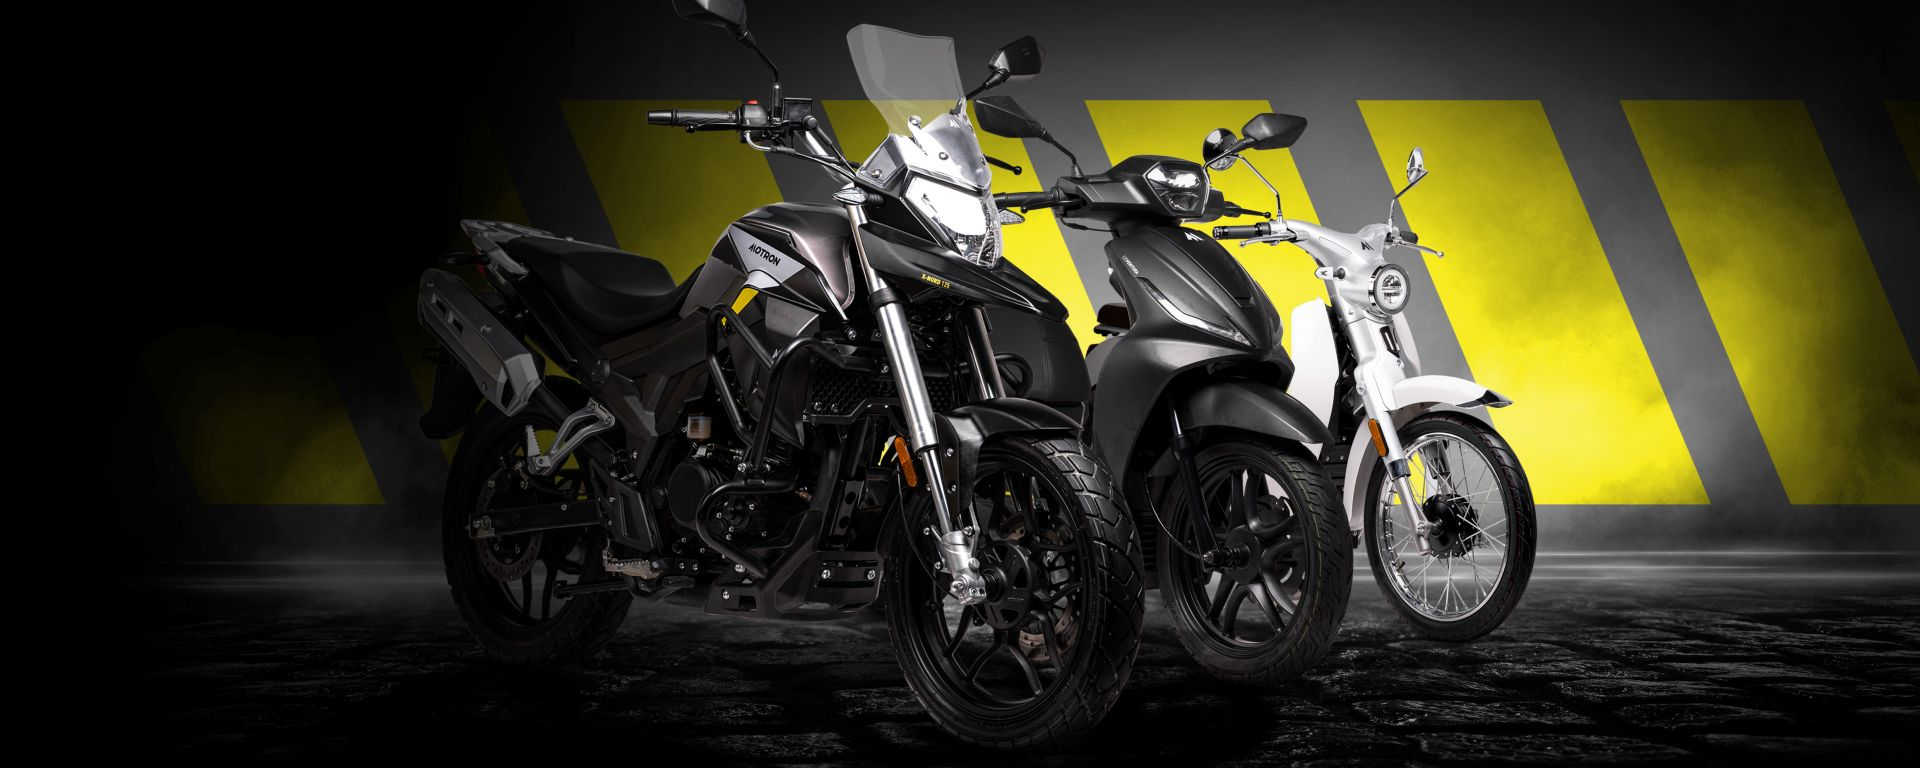 Nasce Motron Motorcycles